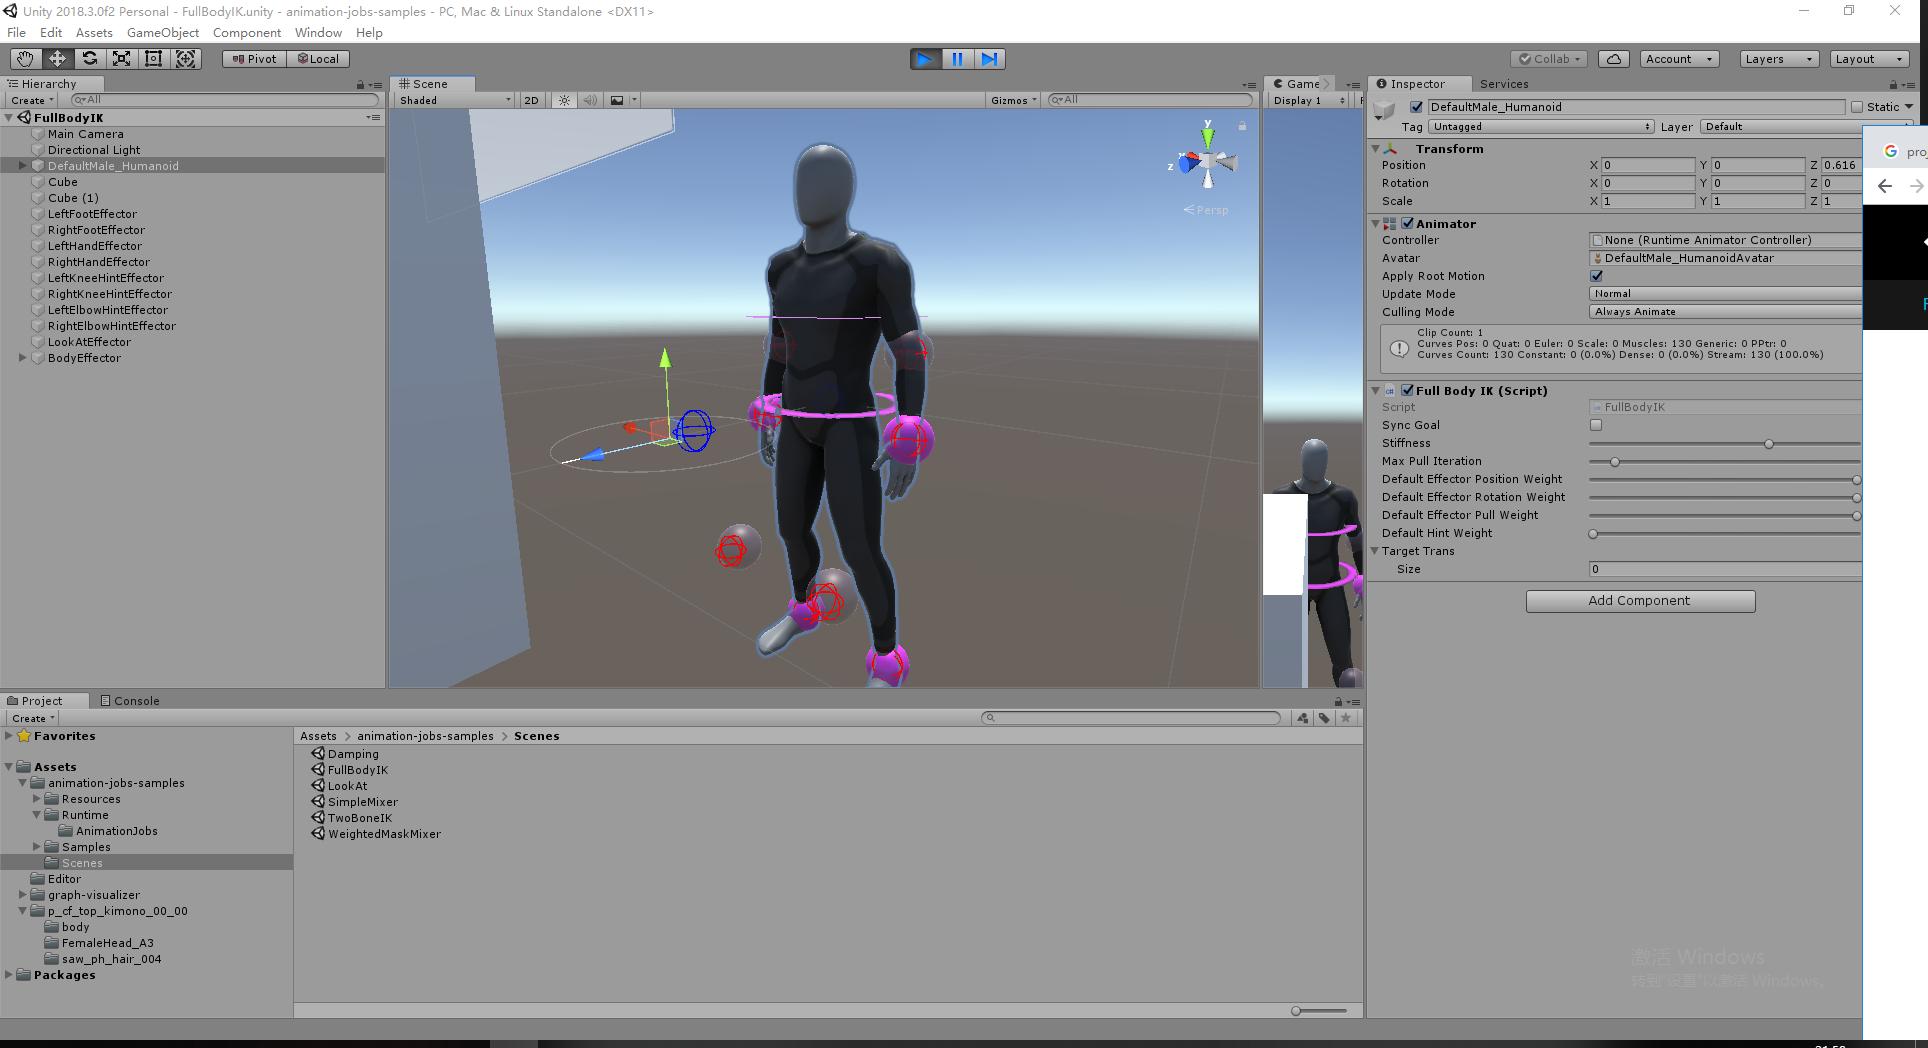 How Add New IK controll to Full Body IK demo? - Unity Forum